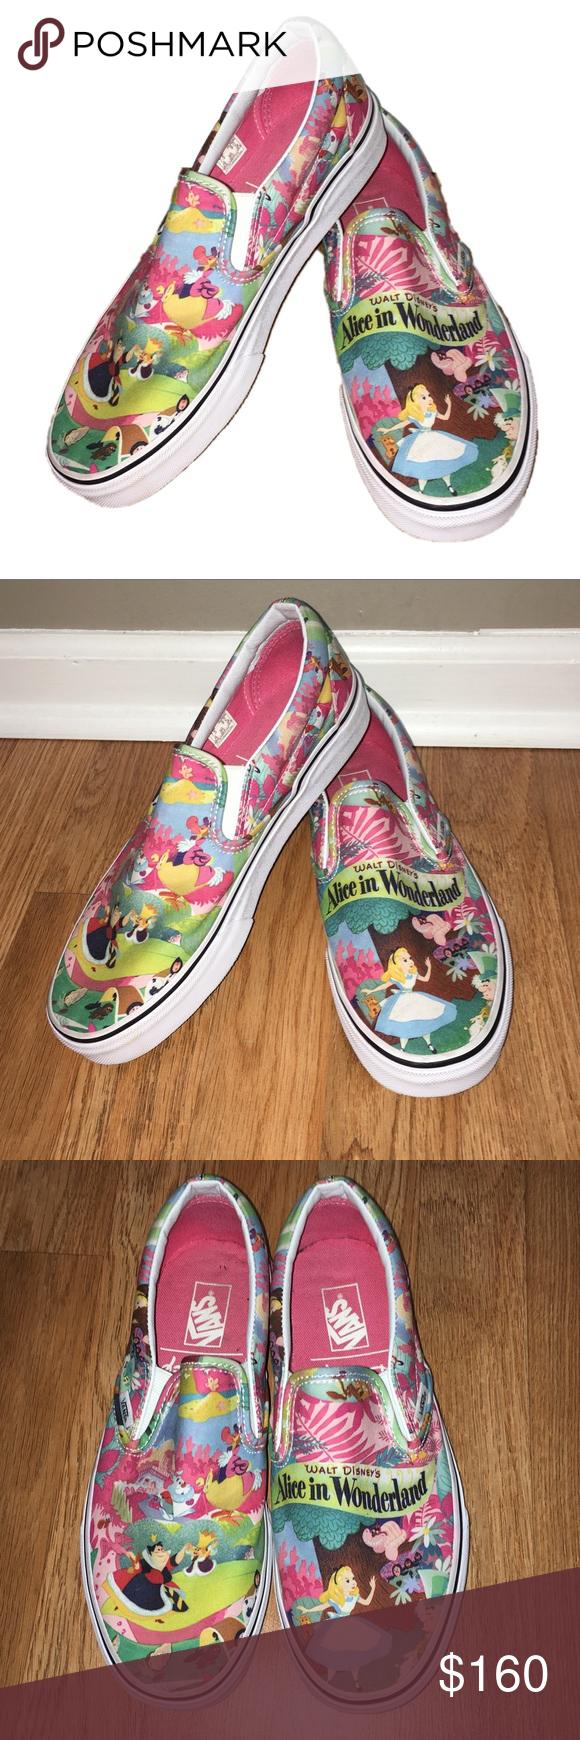 Vans Alice in Wonderland Slip On Shoes